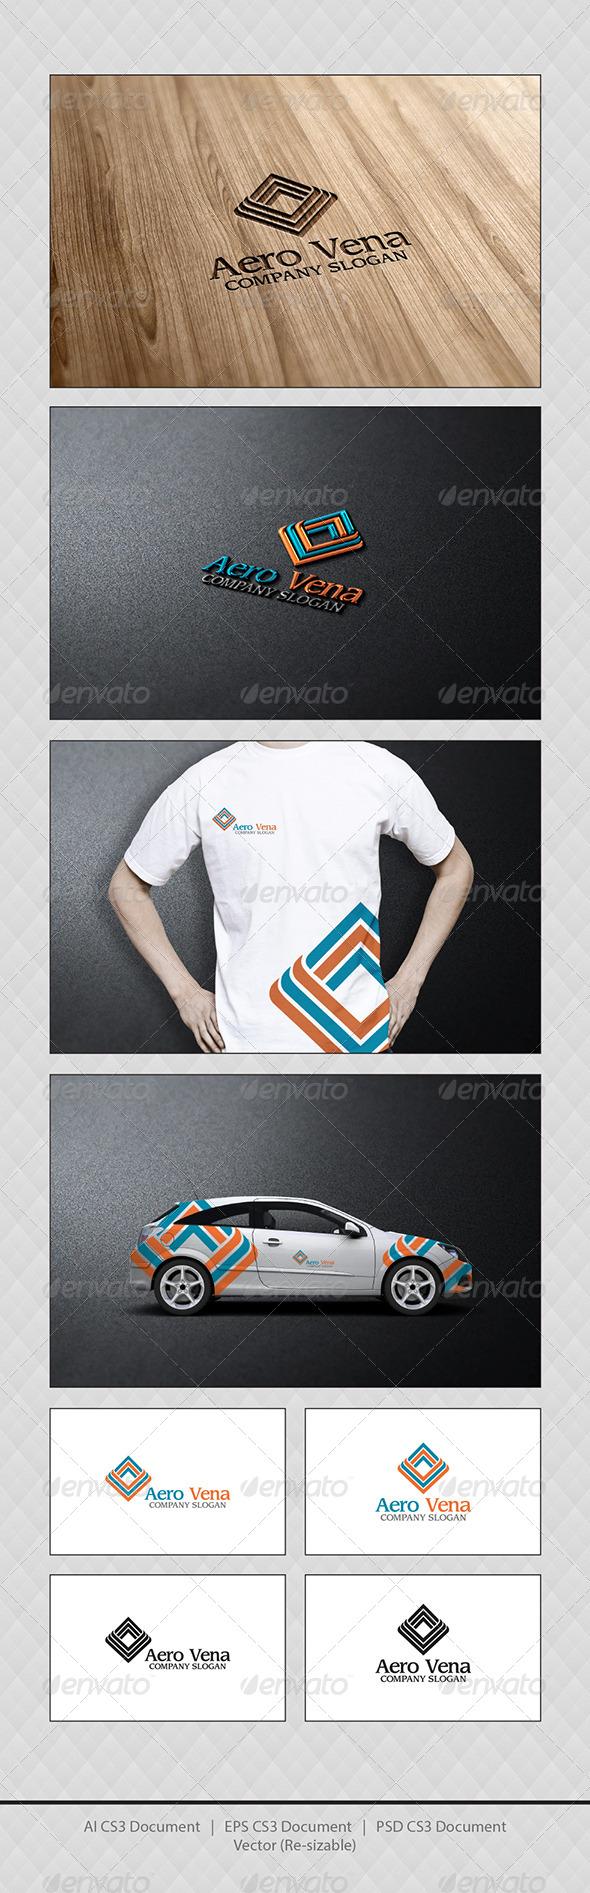 GraphicRiver Aero Vena Logo Templates 4170806